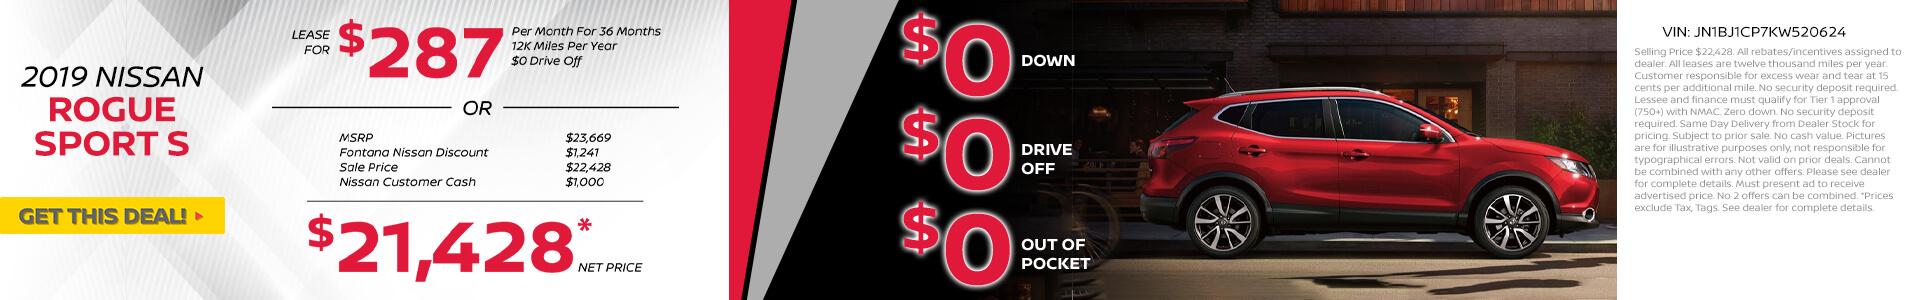 Nissan Rogue Sport $287 Lease